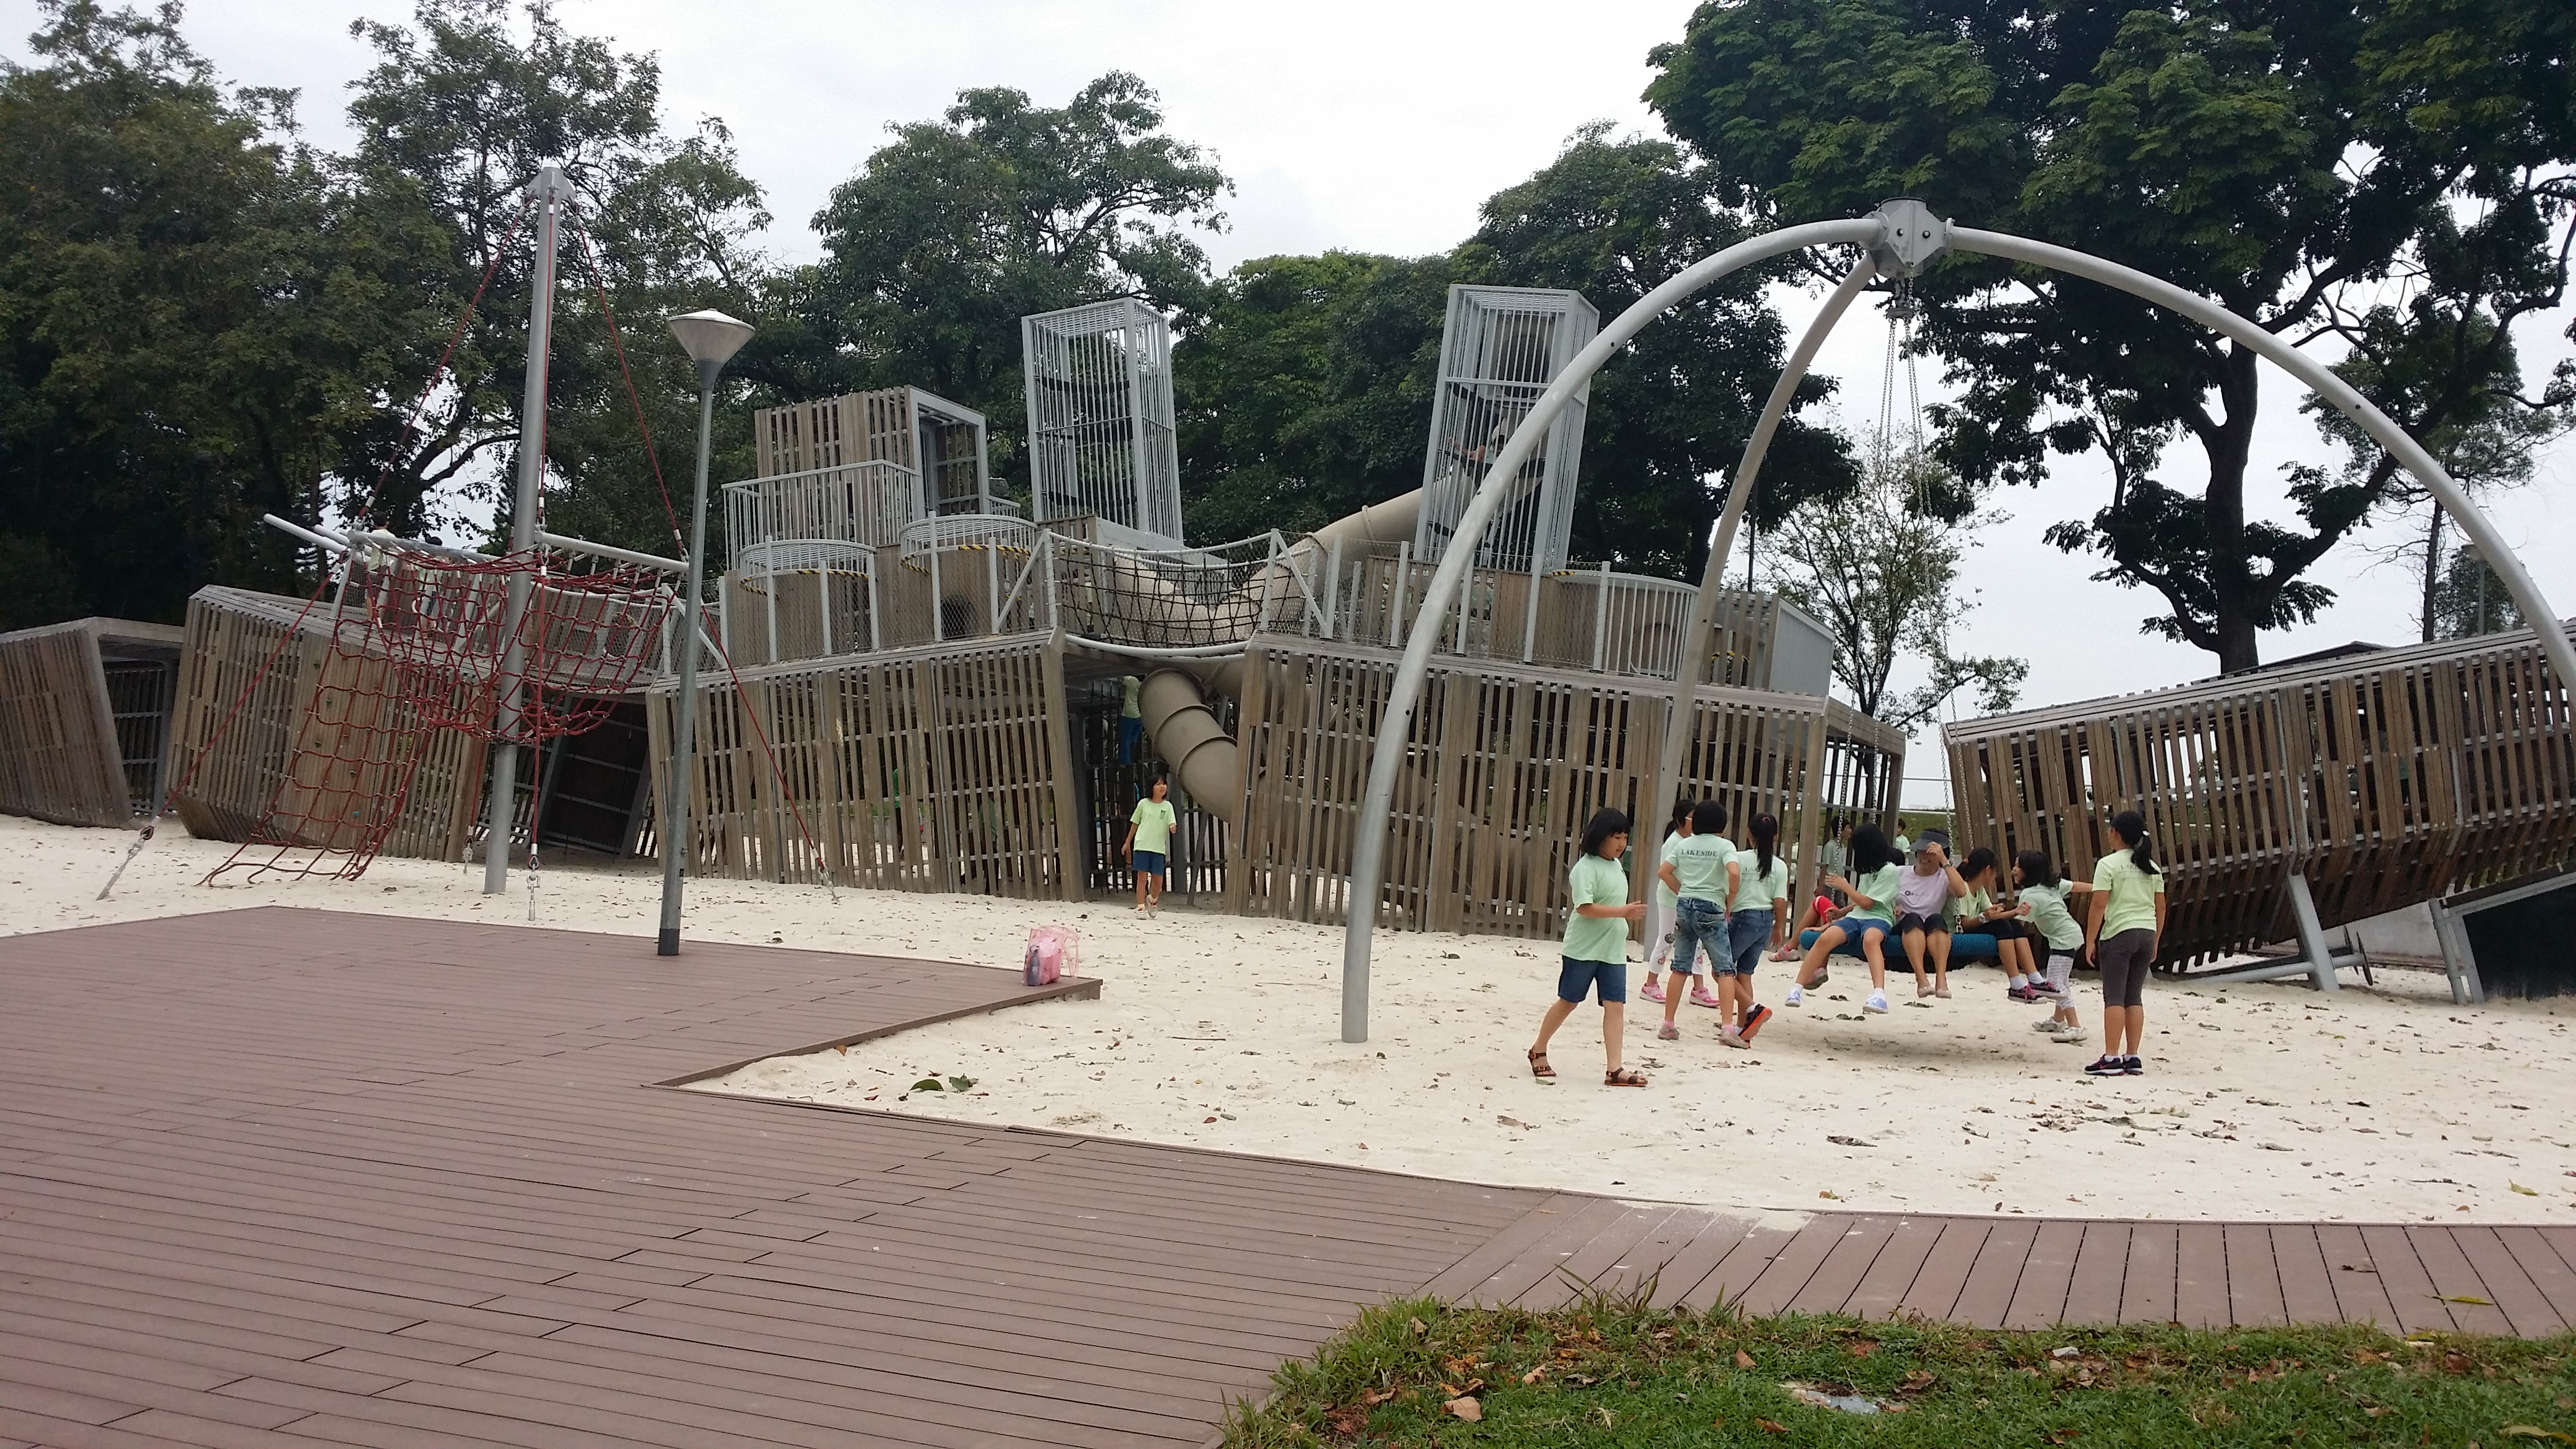 sembawang park outdoor playground singapore